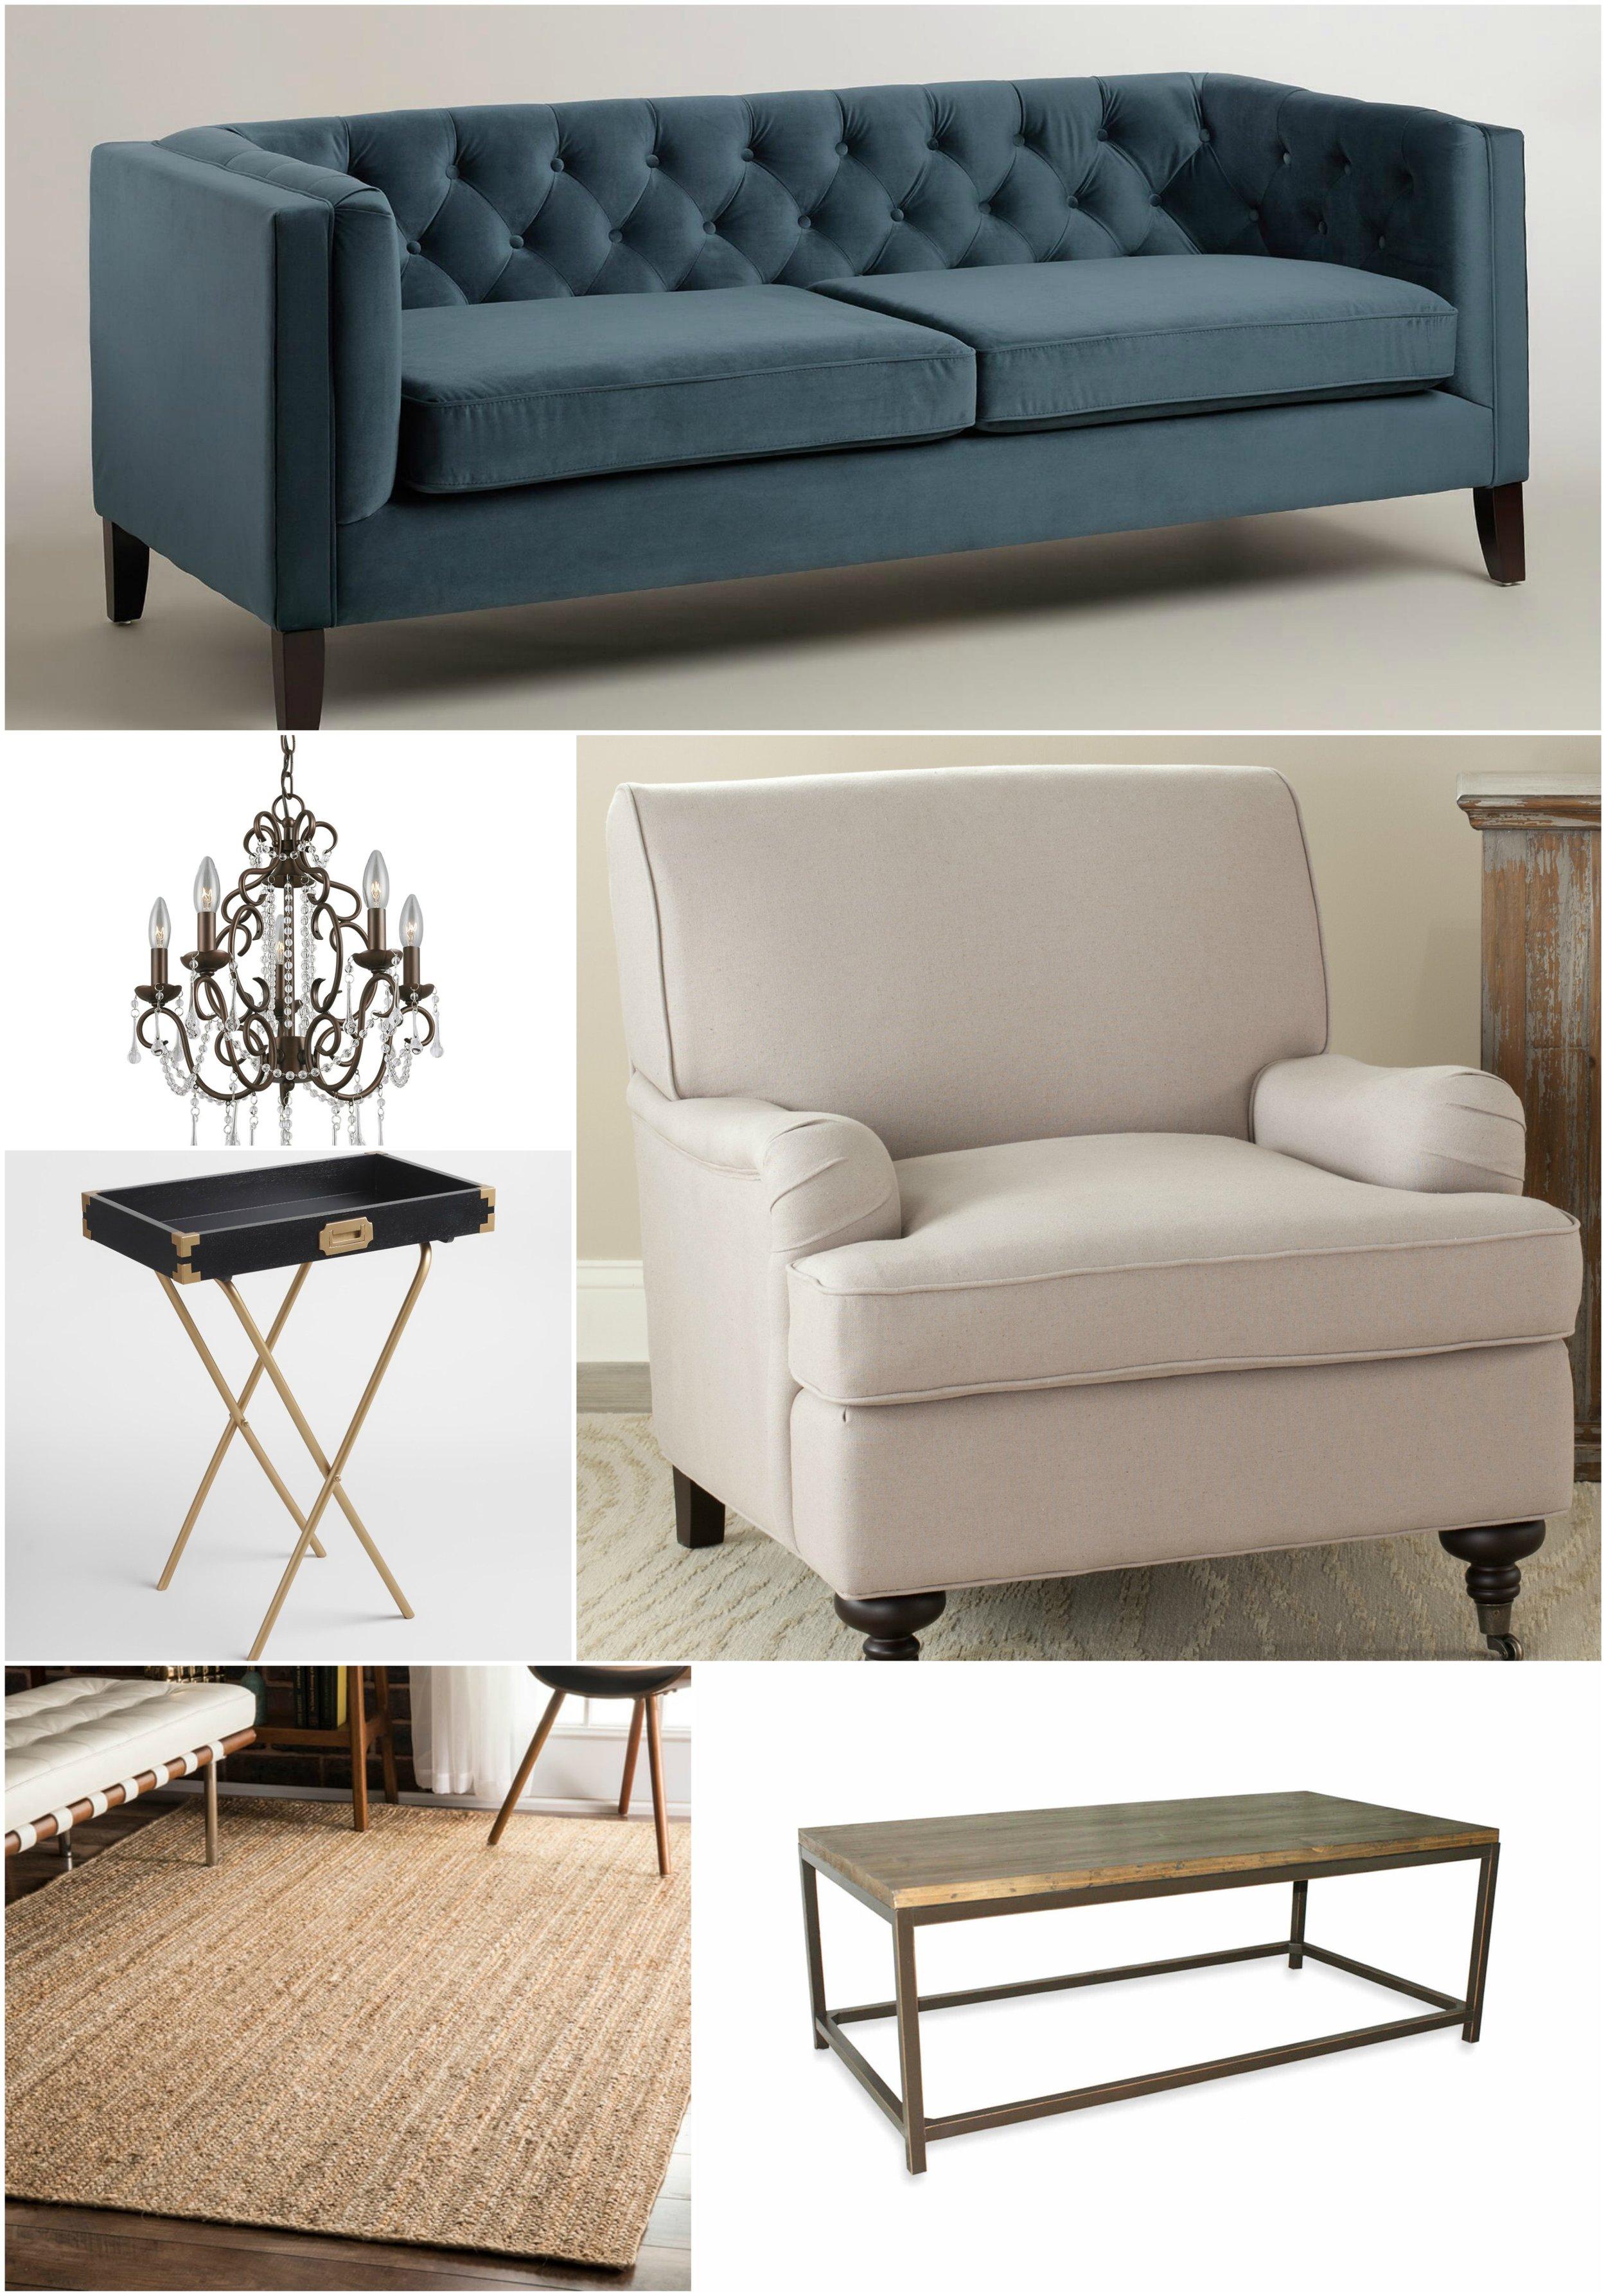 Elizabeth Burns Design | Designer Look for Less: Blue Sofa, Linen Chair, Jute Rug